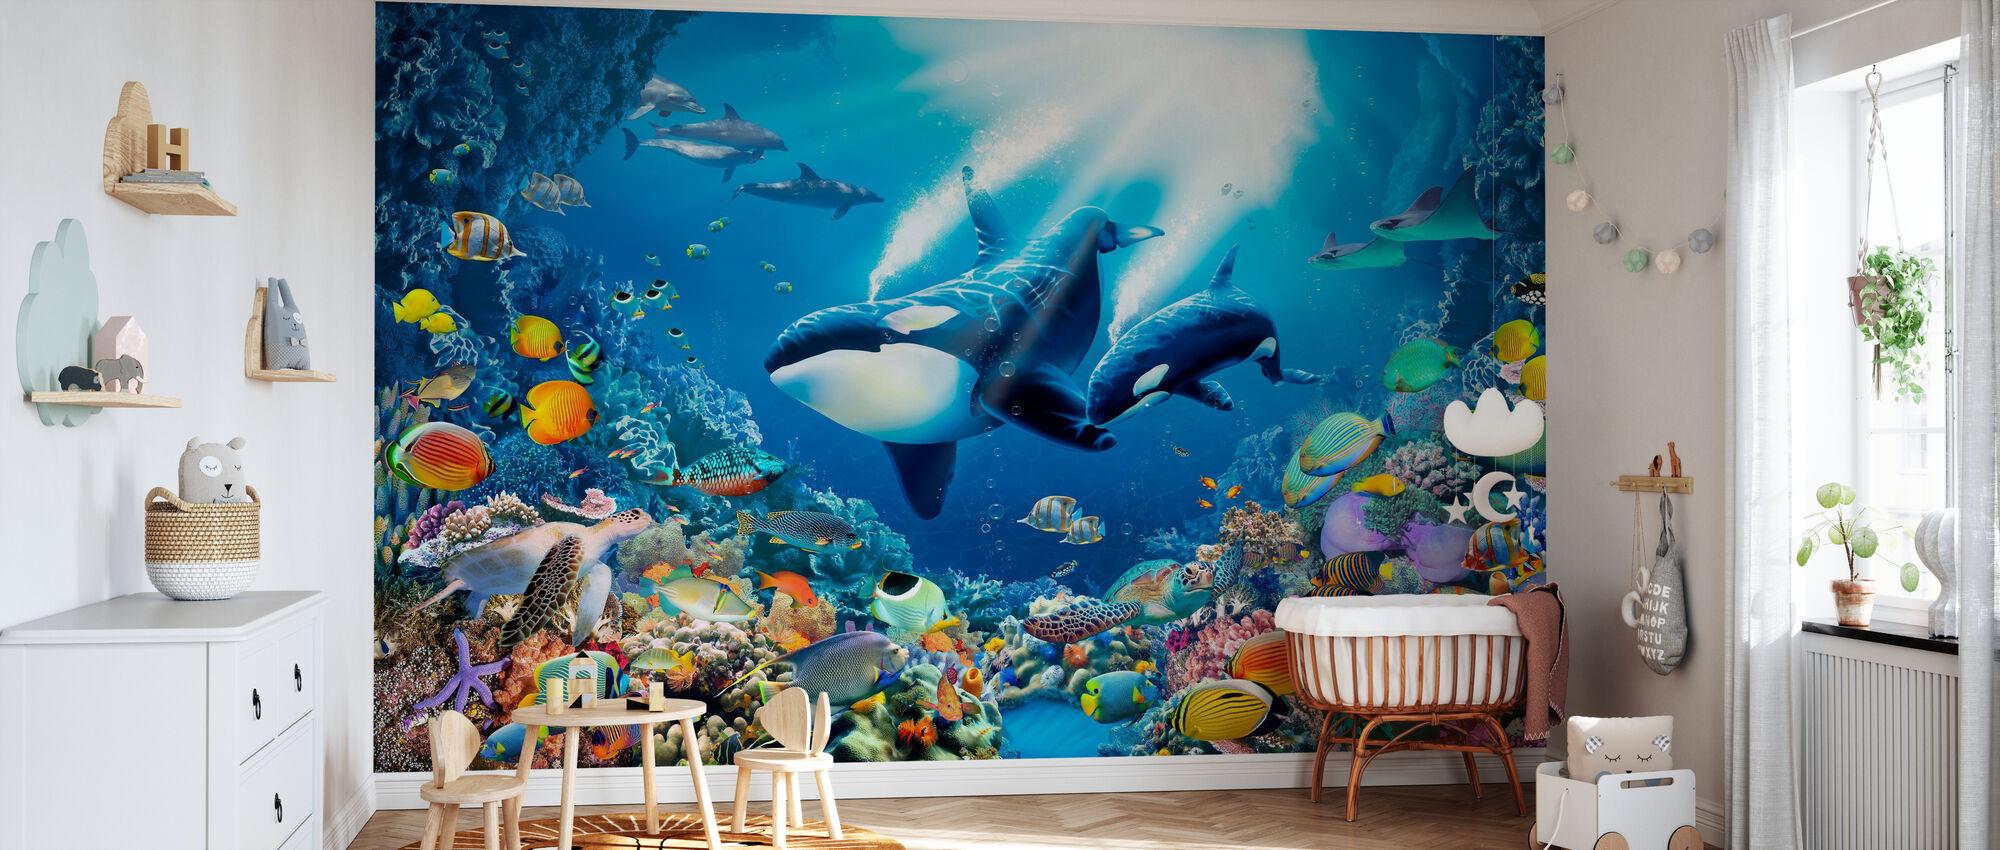 Killer Whales - Wallpaper - Nursery